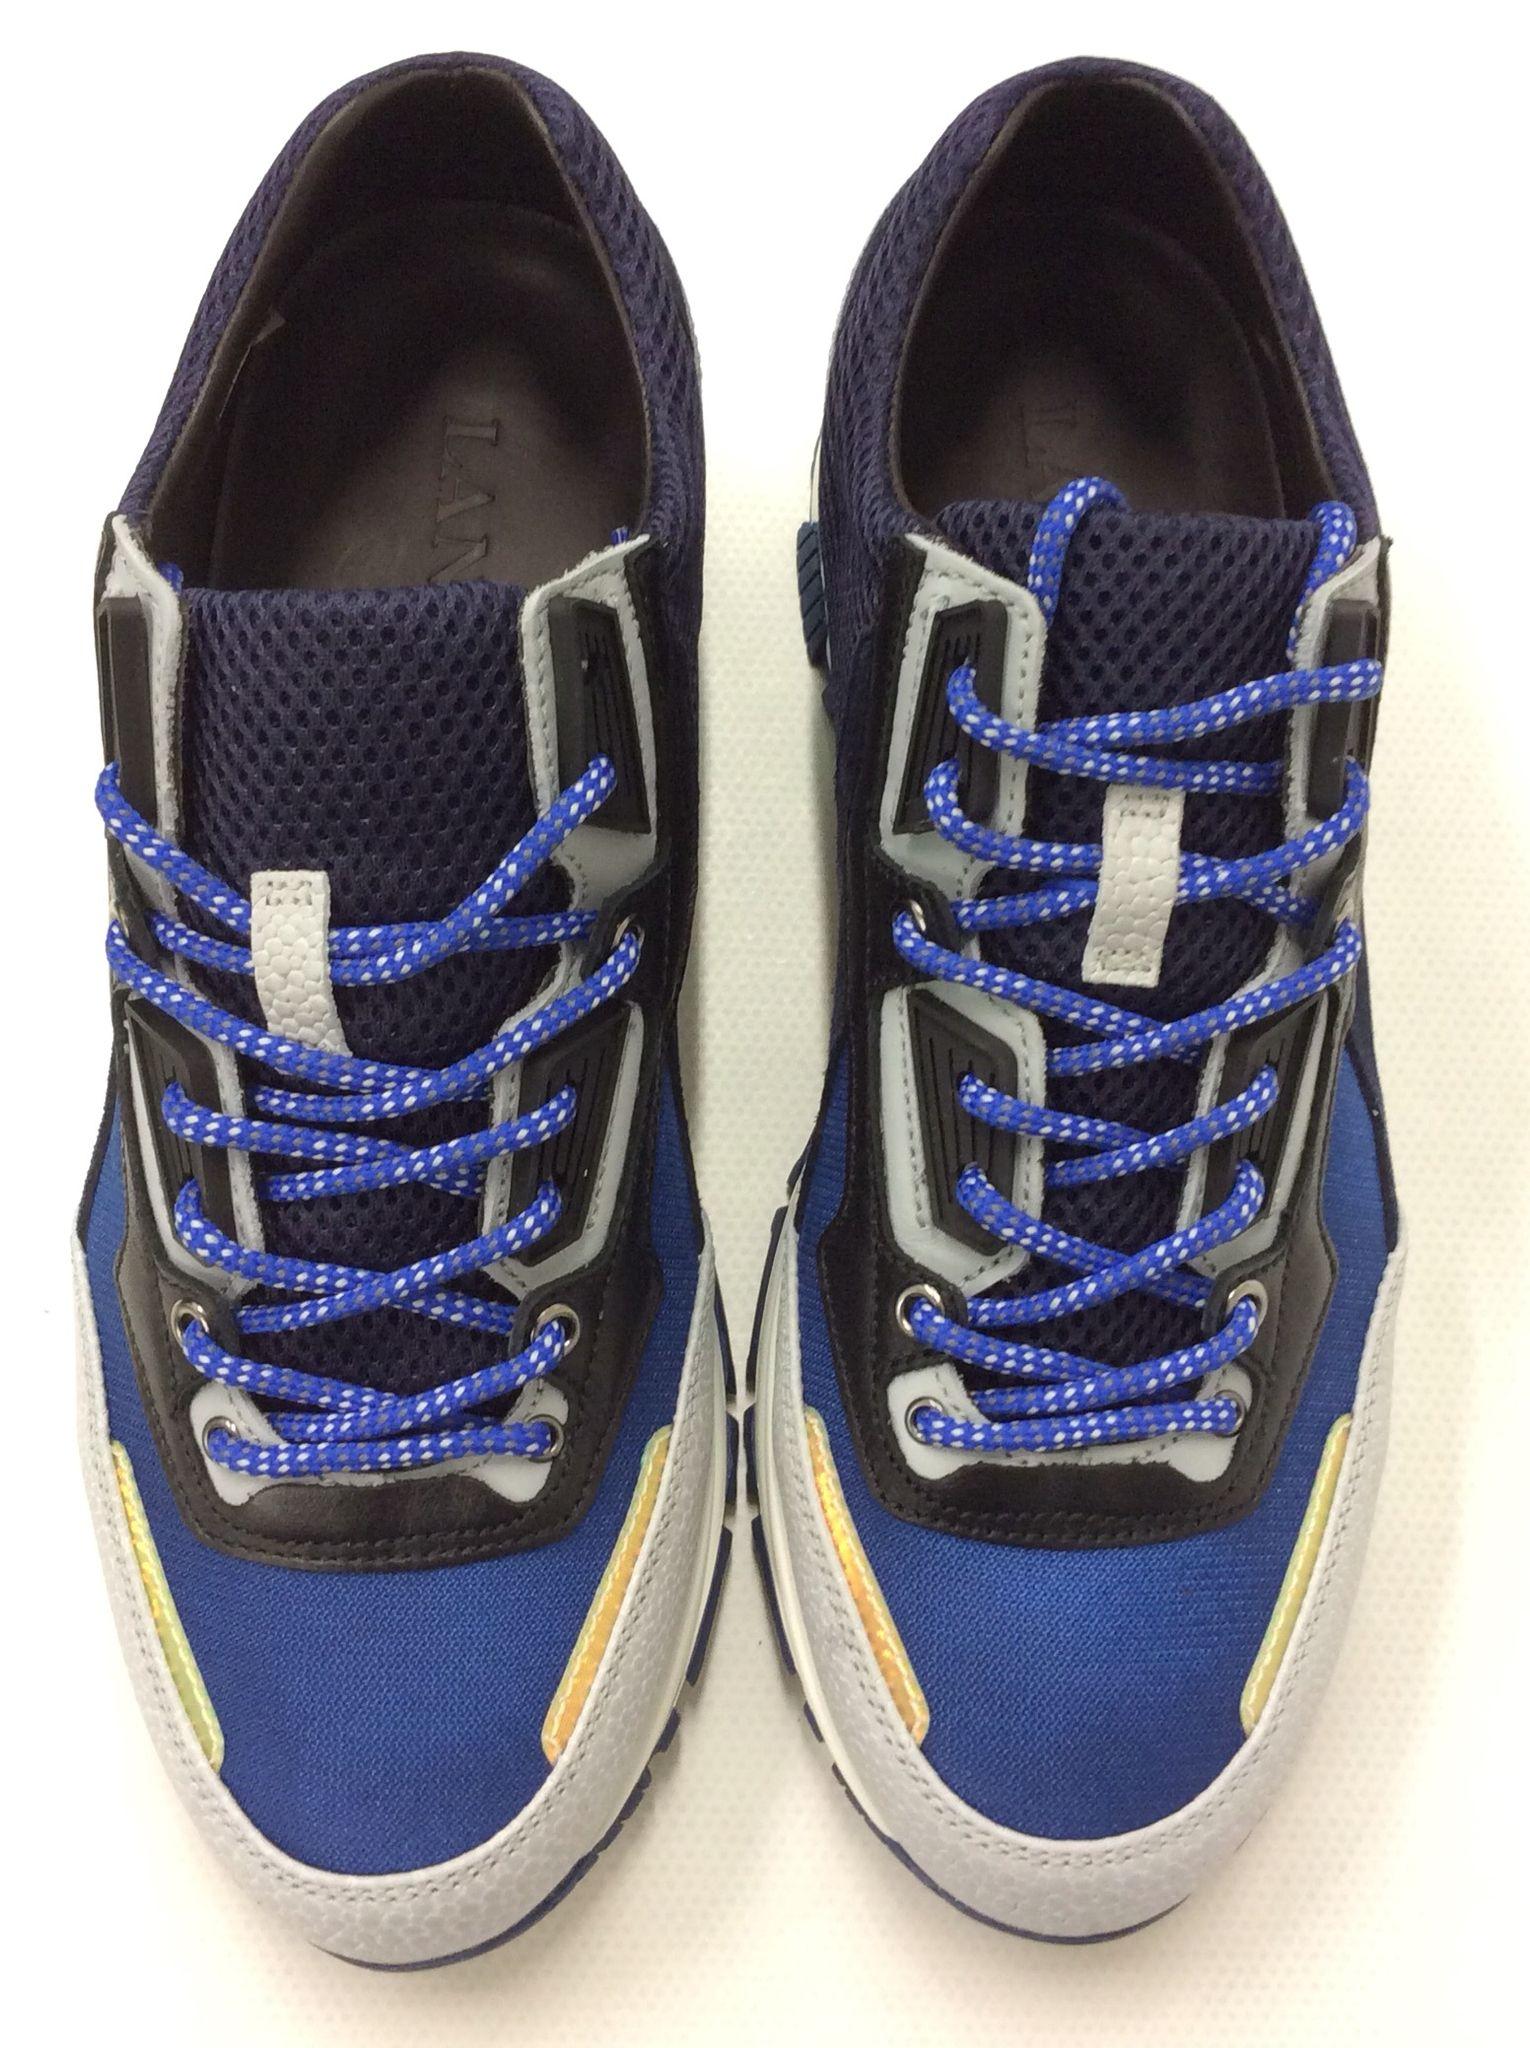 Cobalt sneakerBalmain Faux Frais De Port Offerts mroLcWP